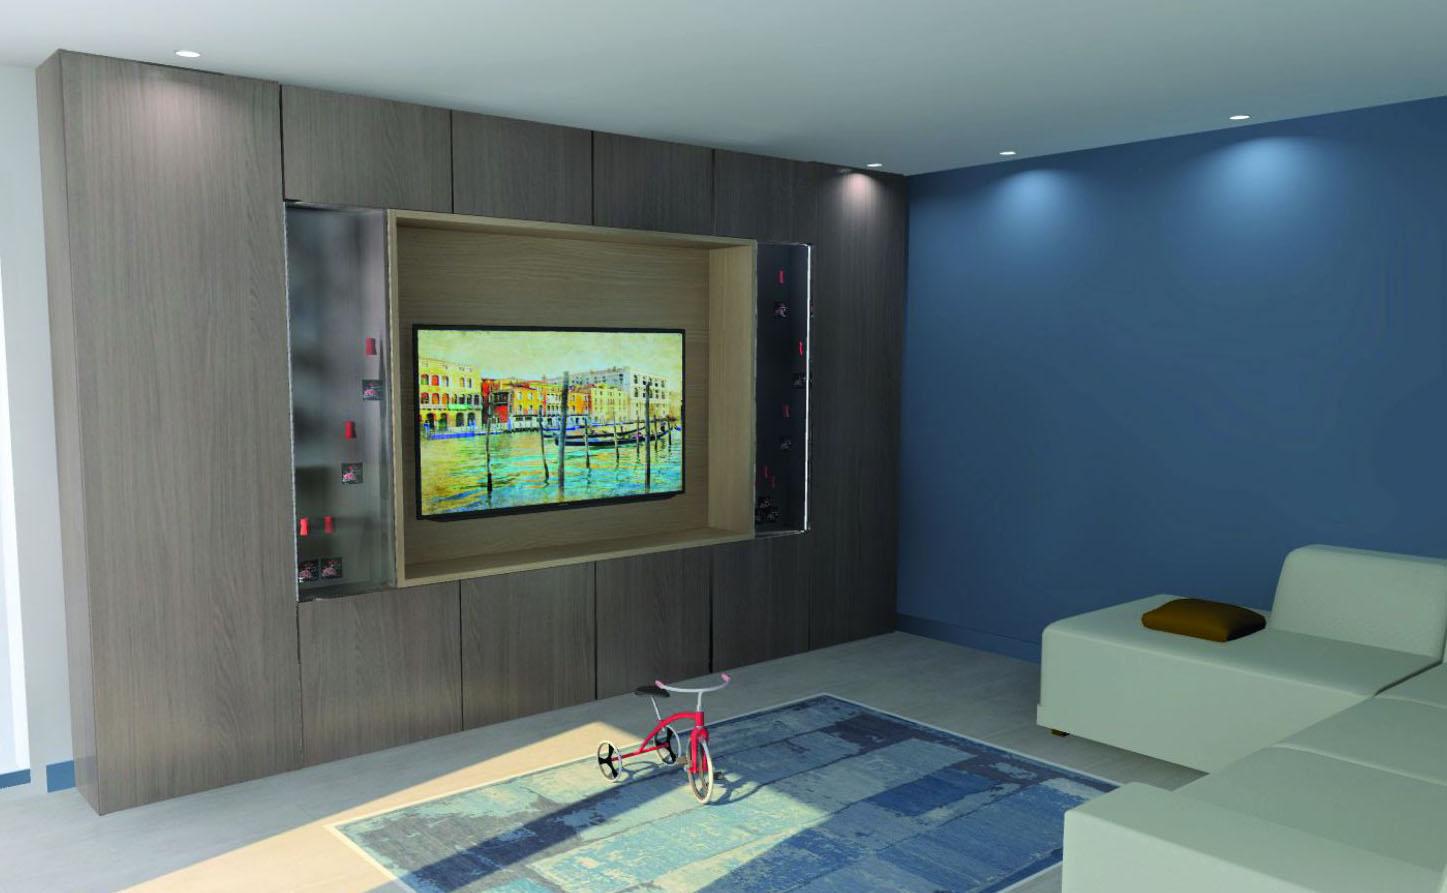 Meuble tv incrusté dans le mur sur mesure